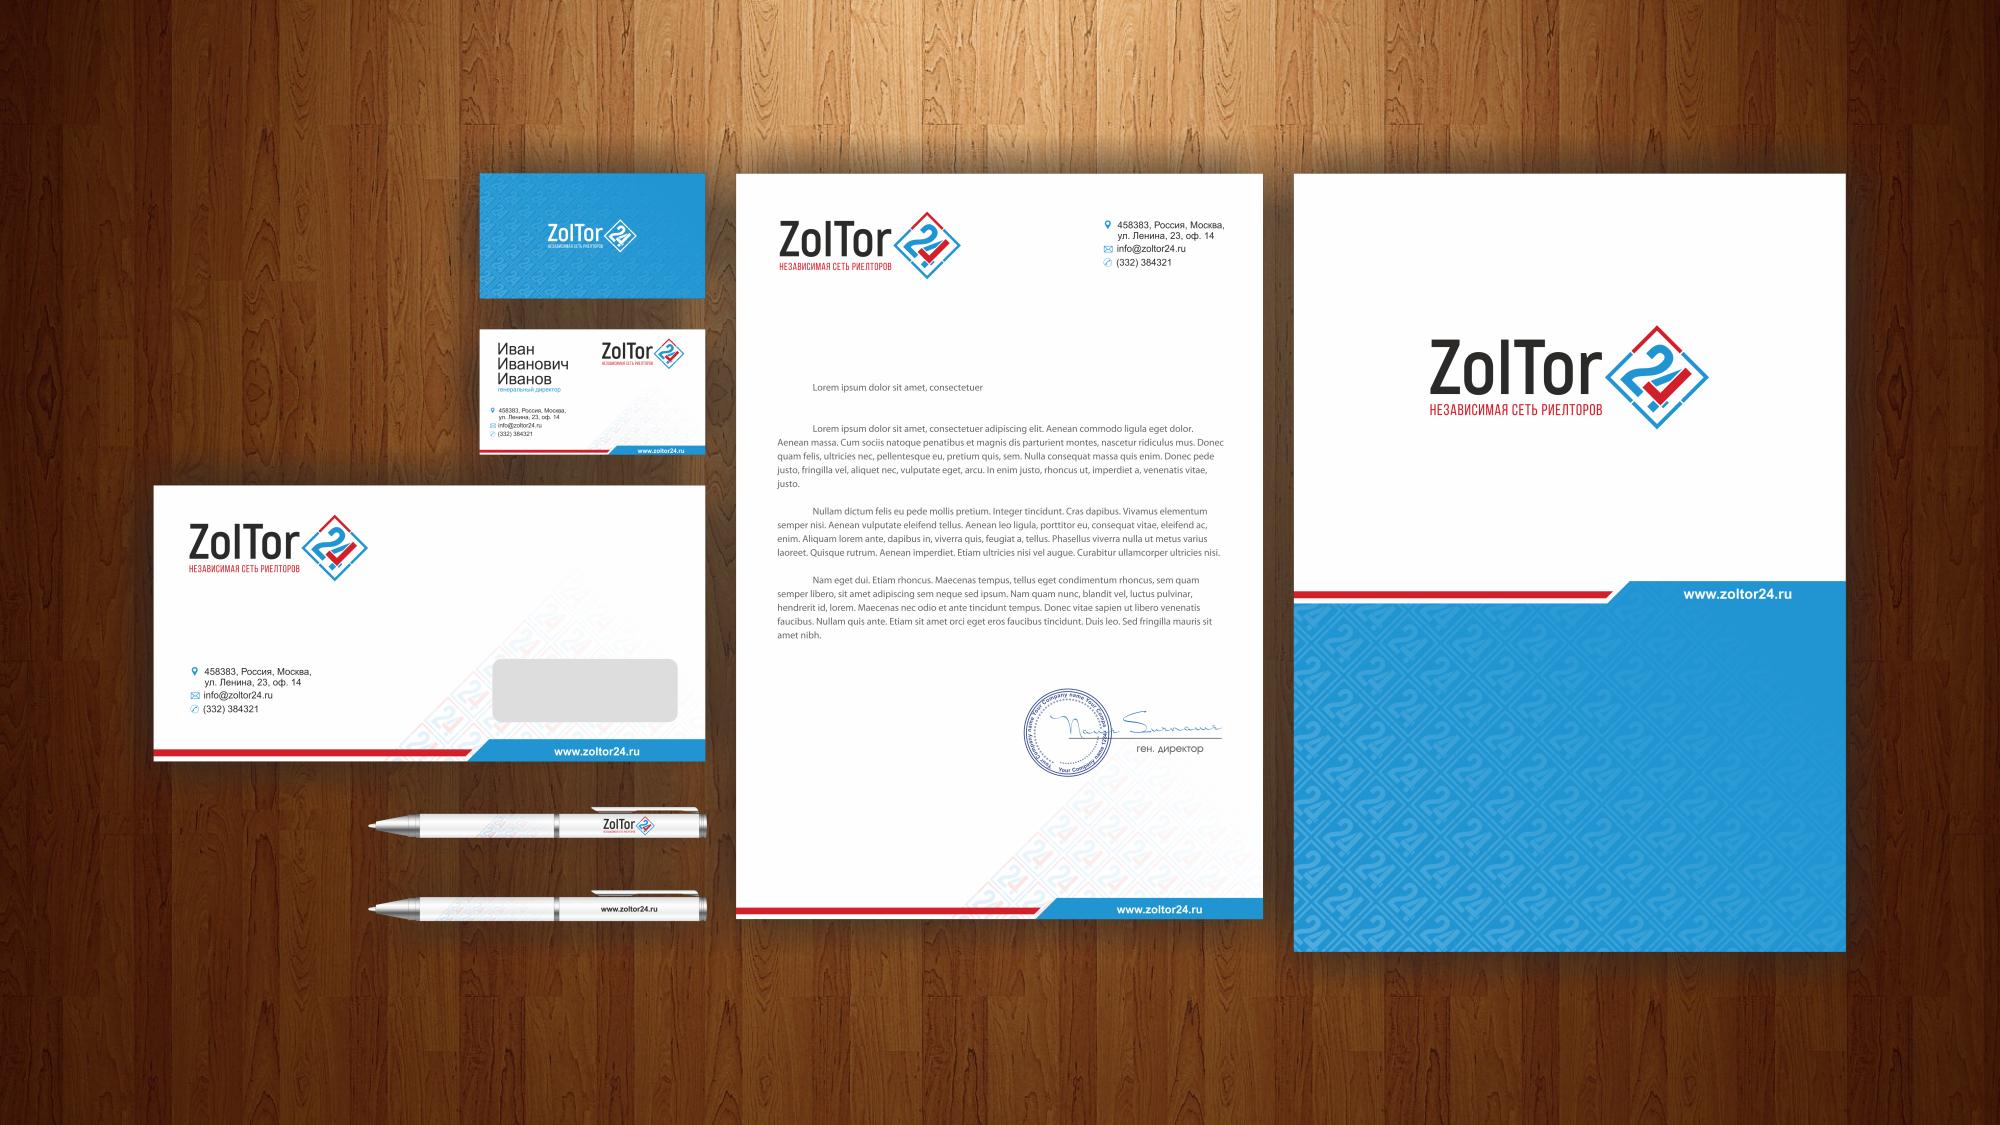 Логотип и фирменный стиль ZolTor24 фото f_6175c960bea68748.jpg